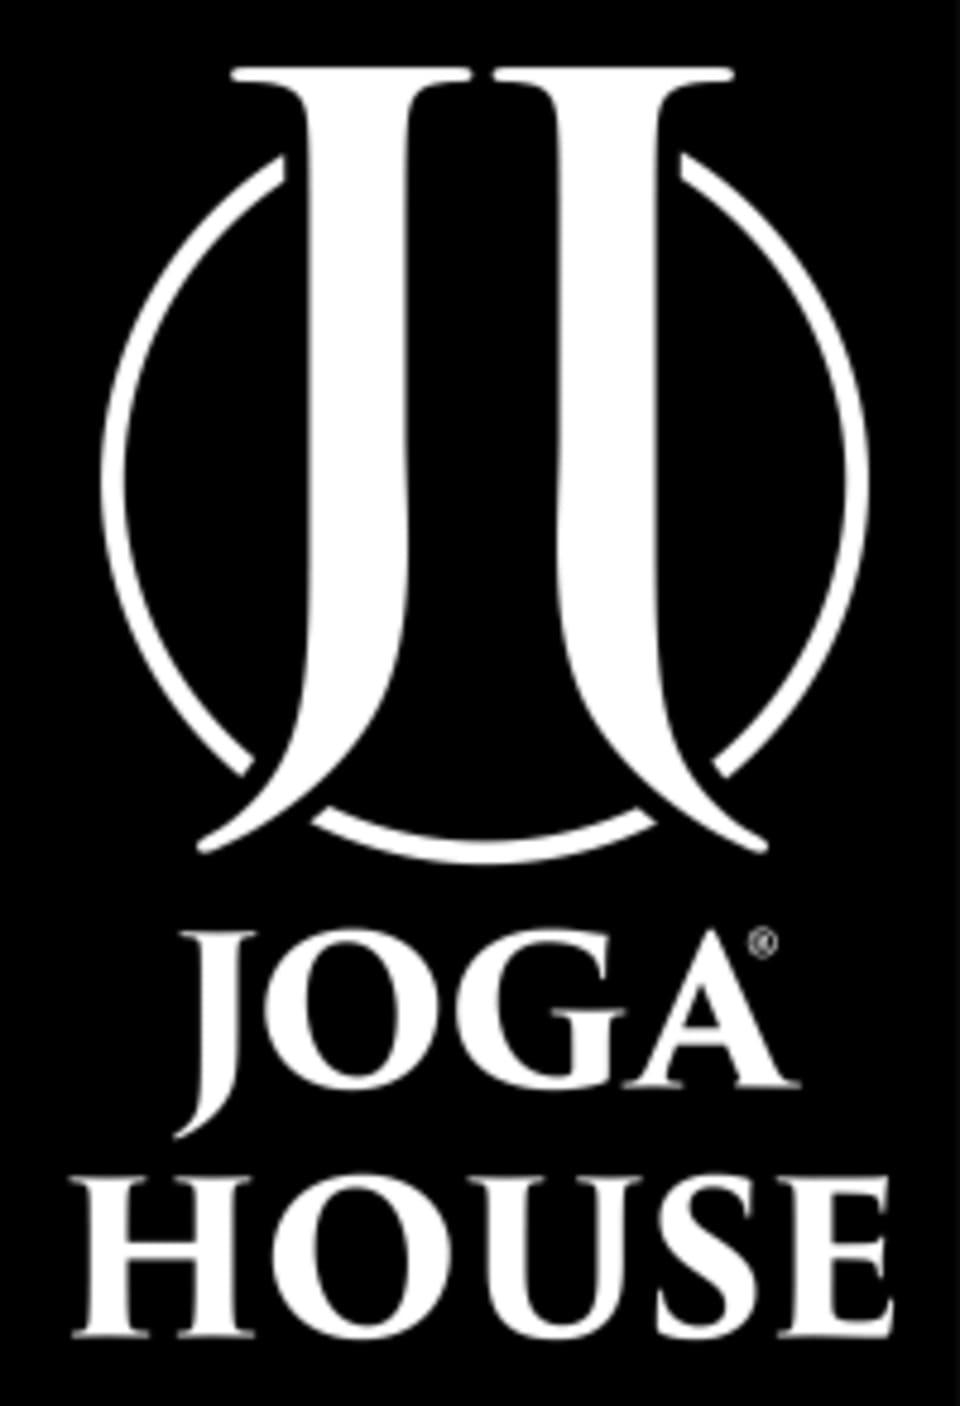 Joga House logo